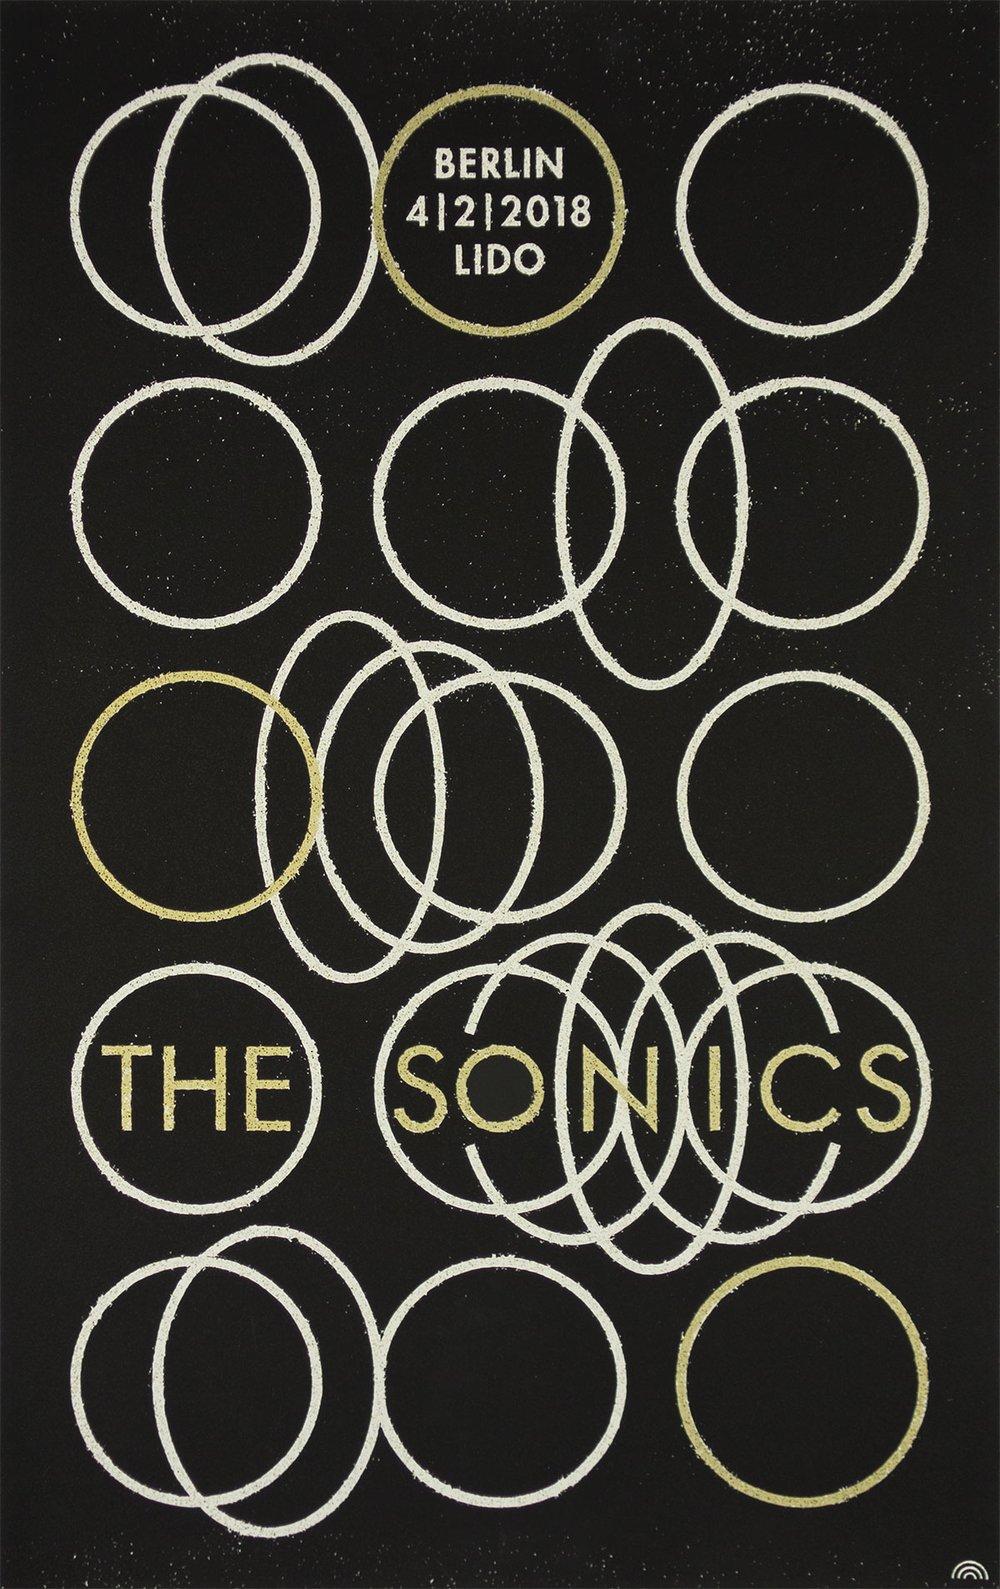 Image of THE SONICS